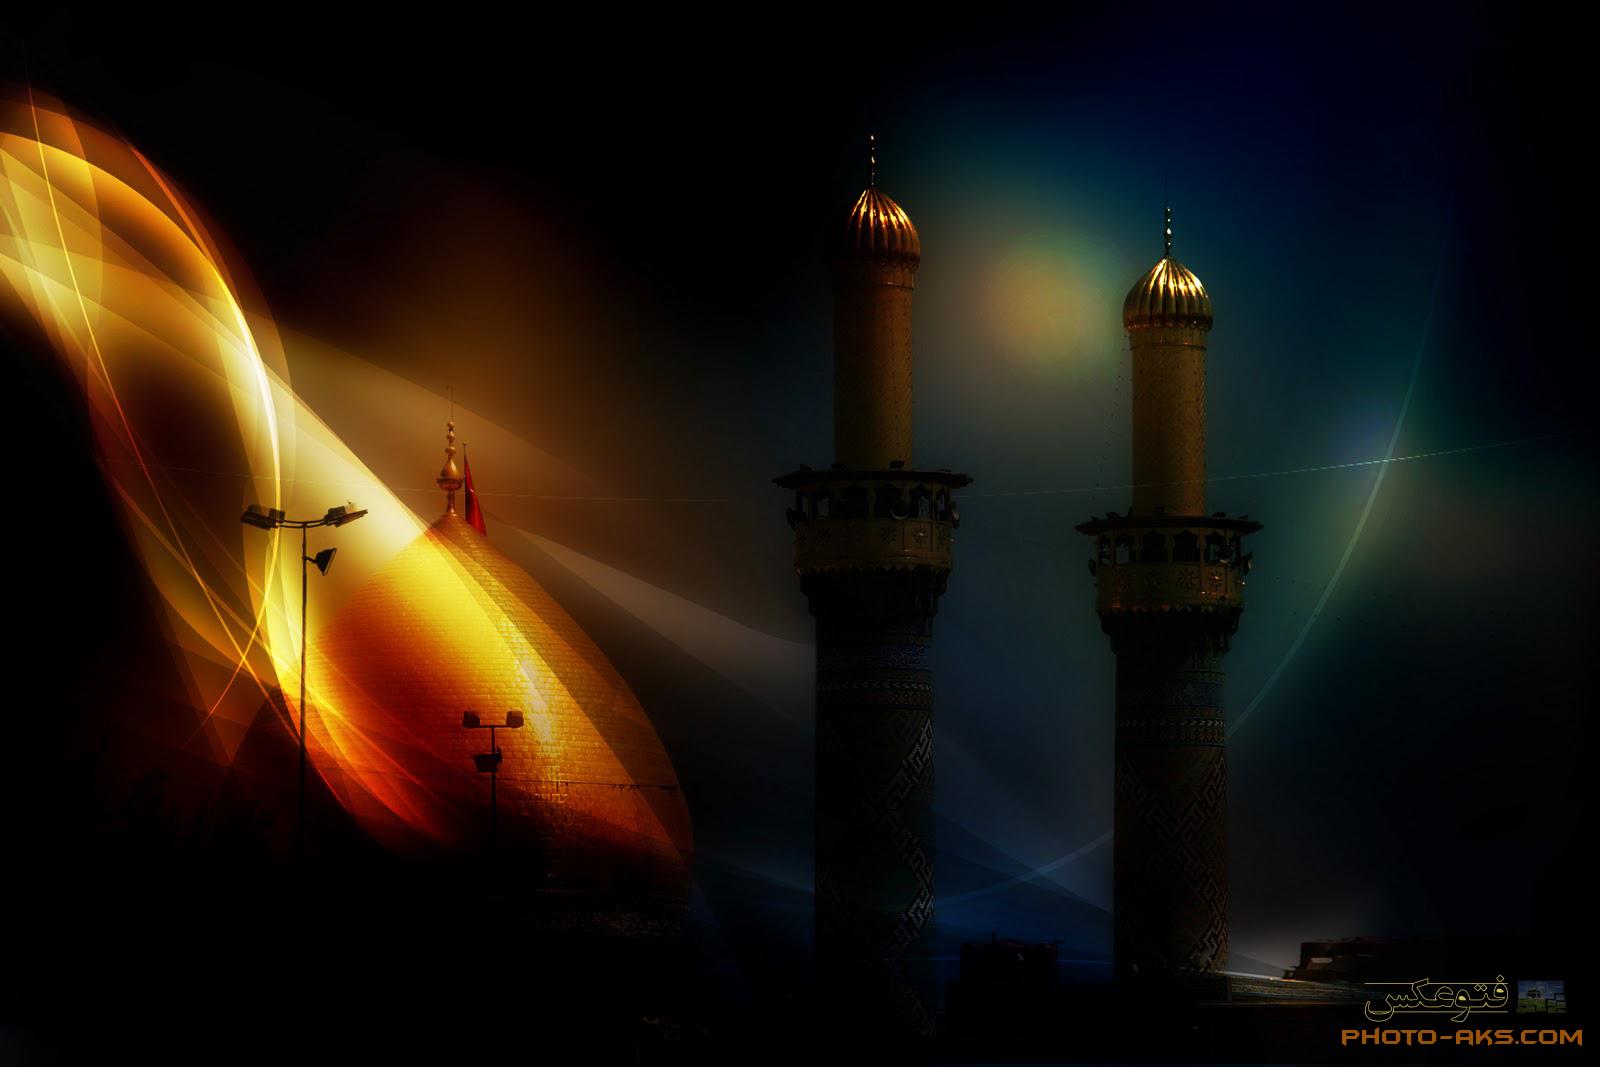 Haram of Hazrat Abalfazl, Brother of Imam Hussein (AS) الصورة الخلفية: حرم أبي الفضل